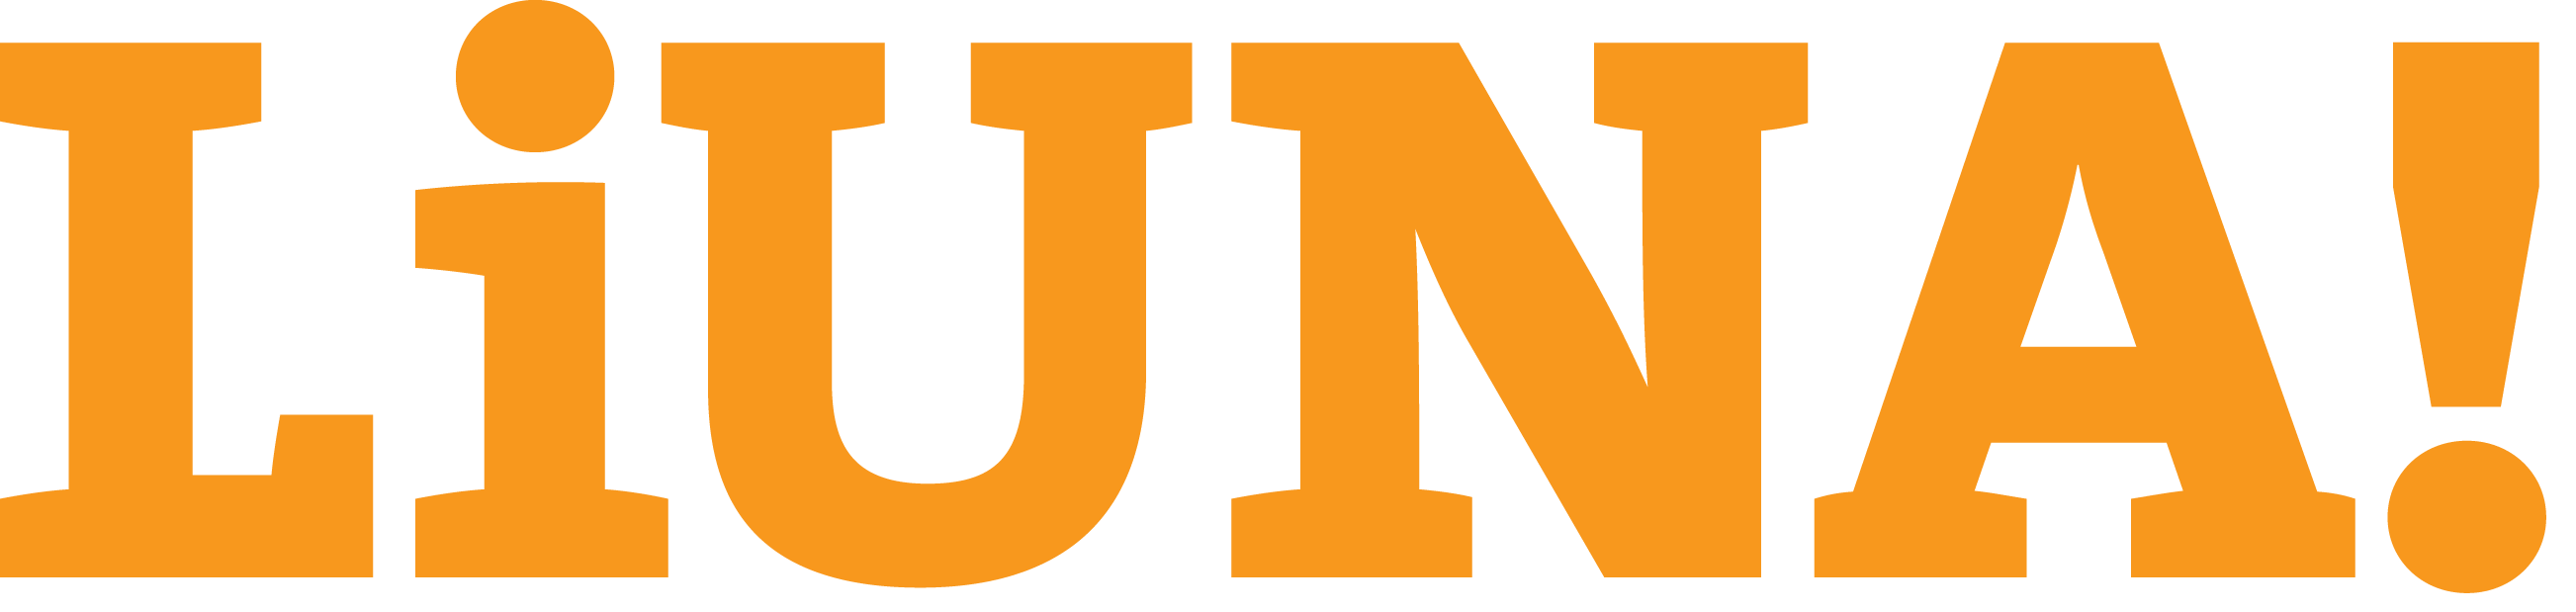 liunadropcap_(1).png